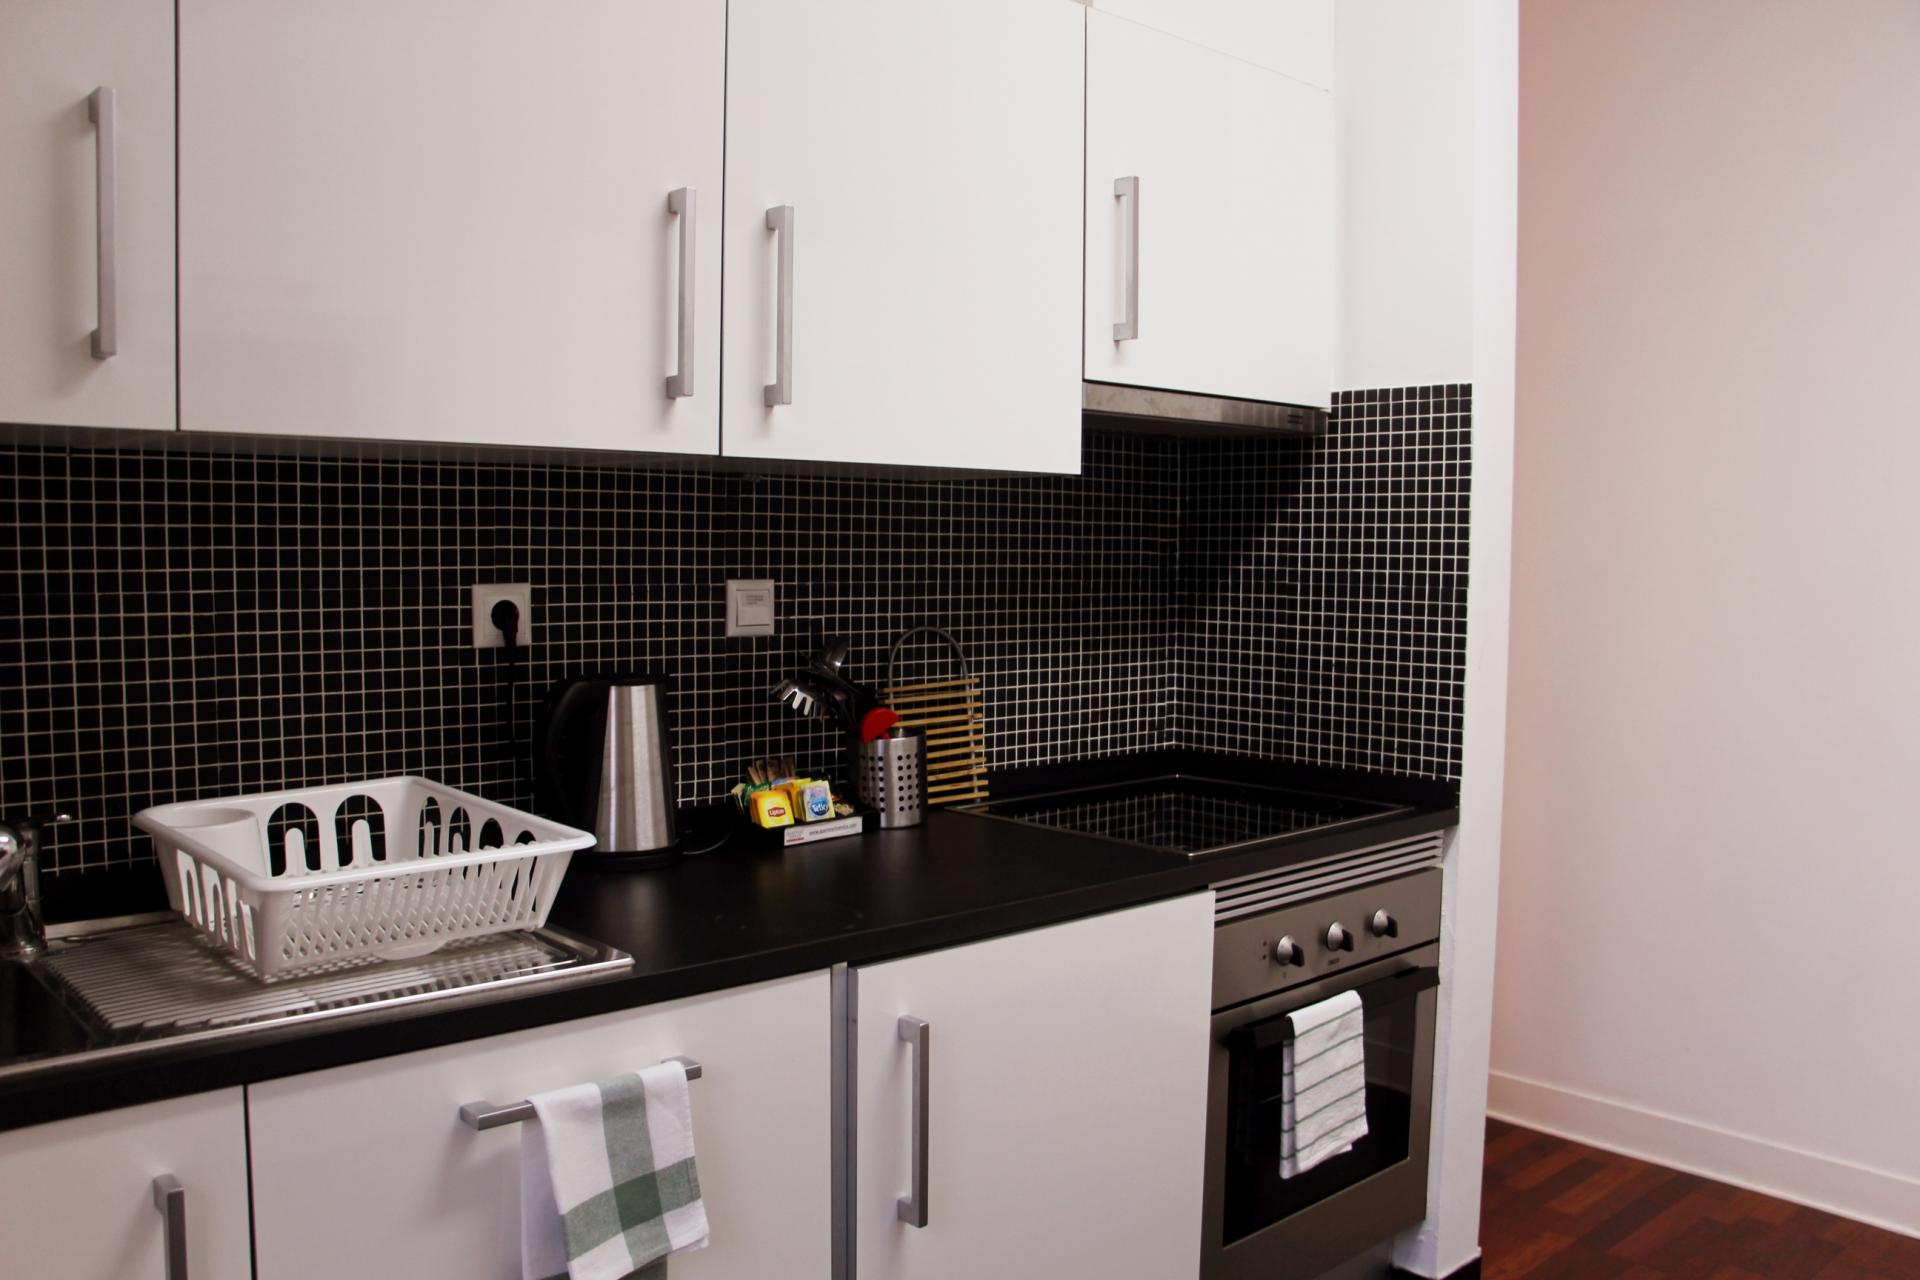 Kitchen at Santos River Serviced Apartments